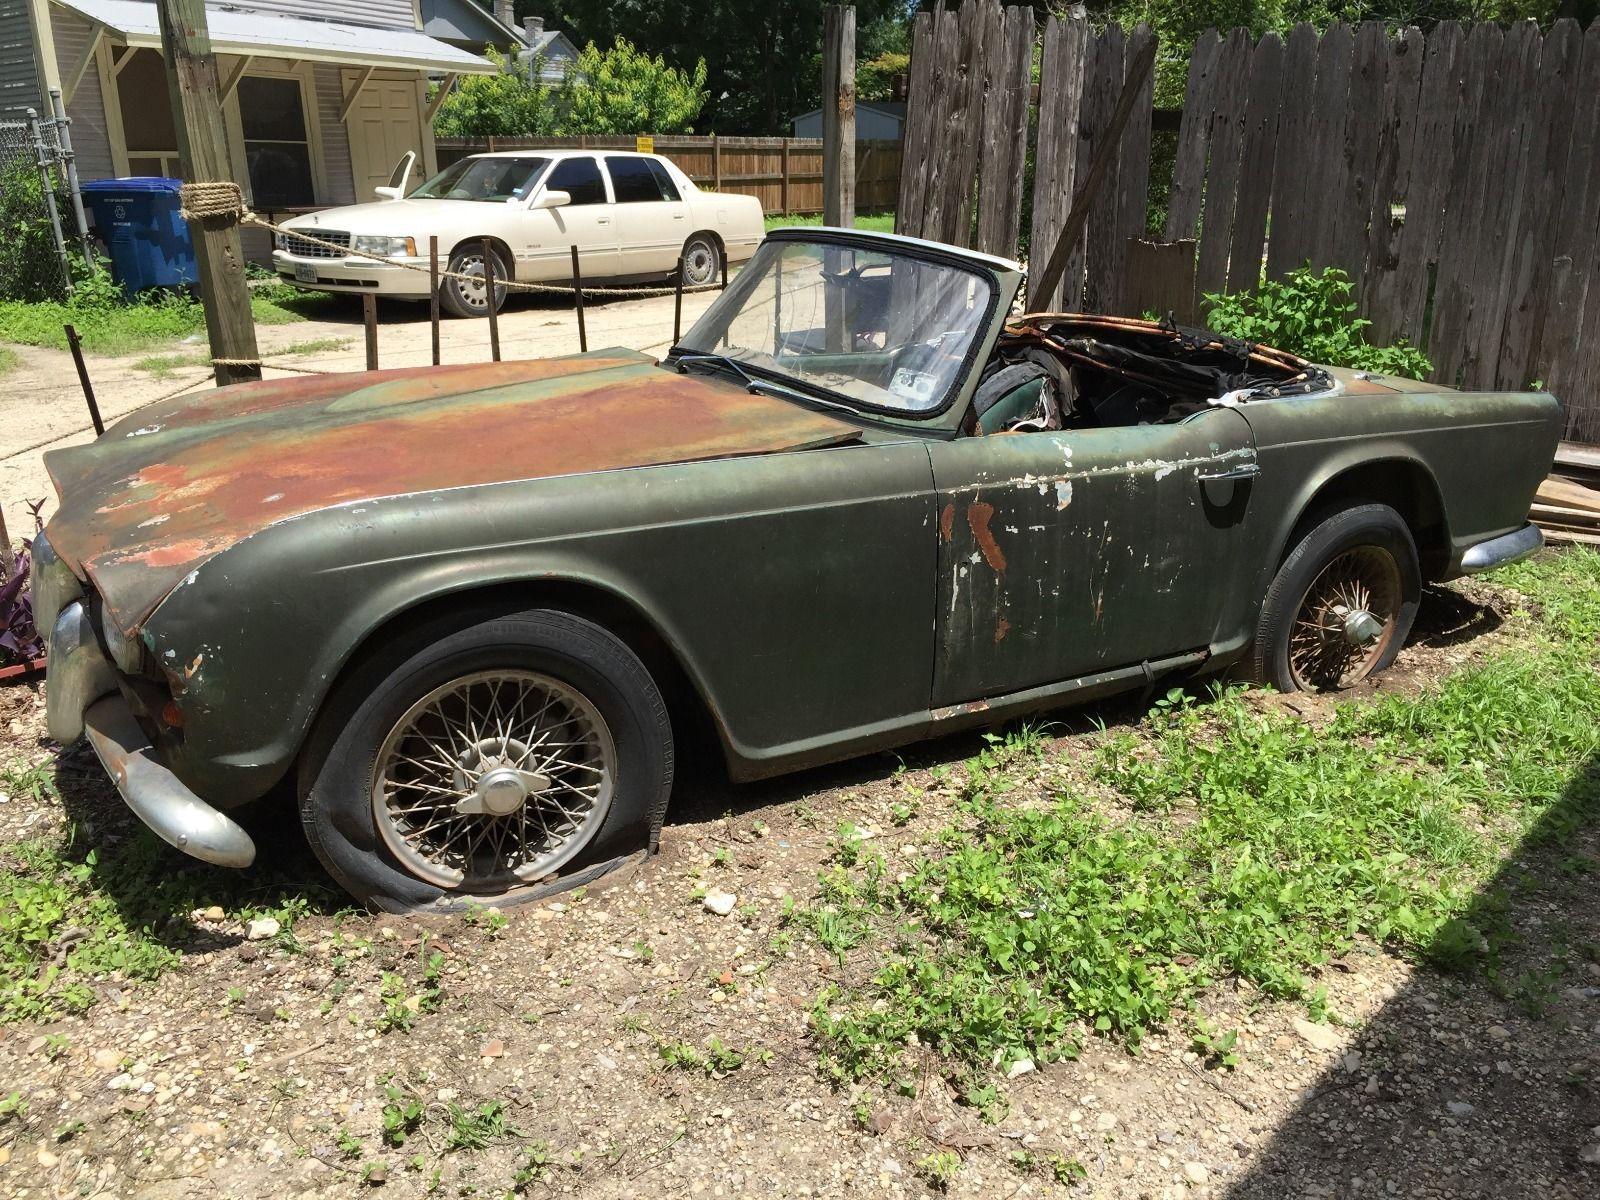 1961 Triumph TR4 Car For Parts Perfect Restoration Source